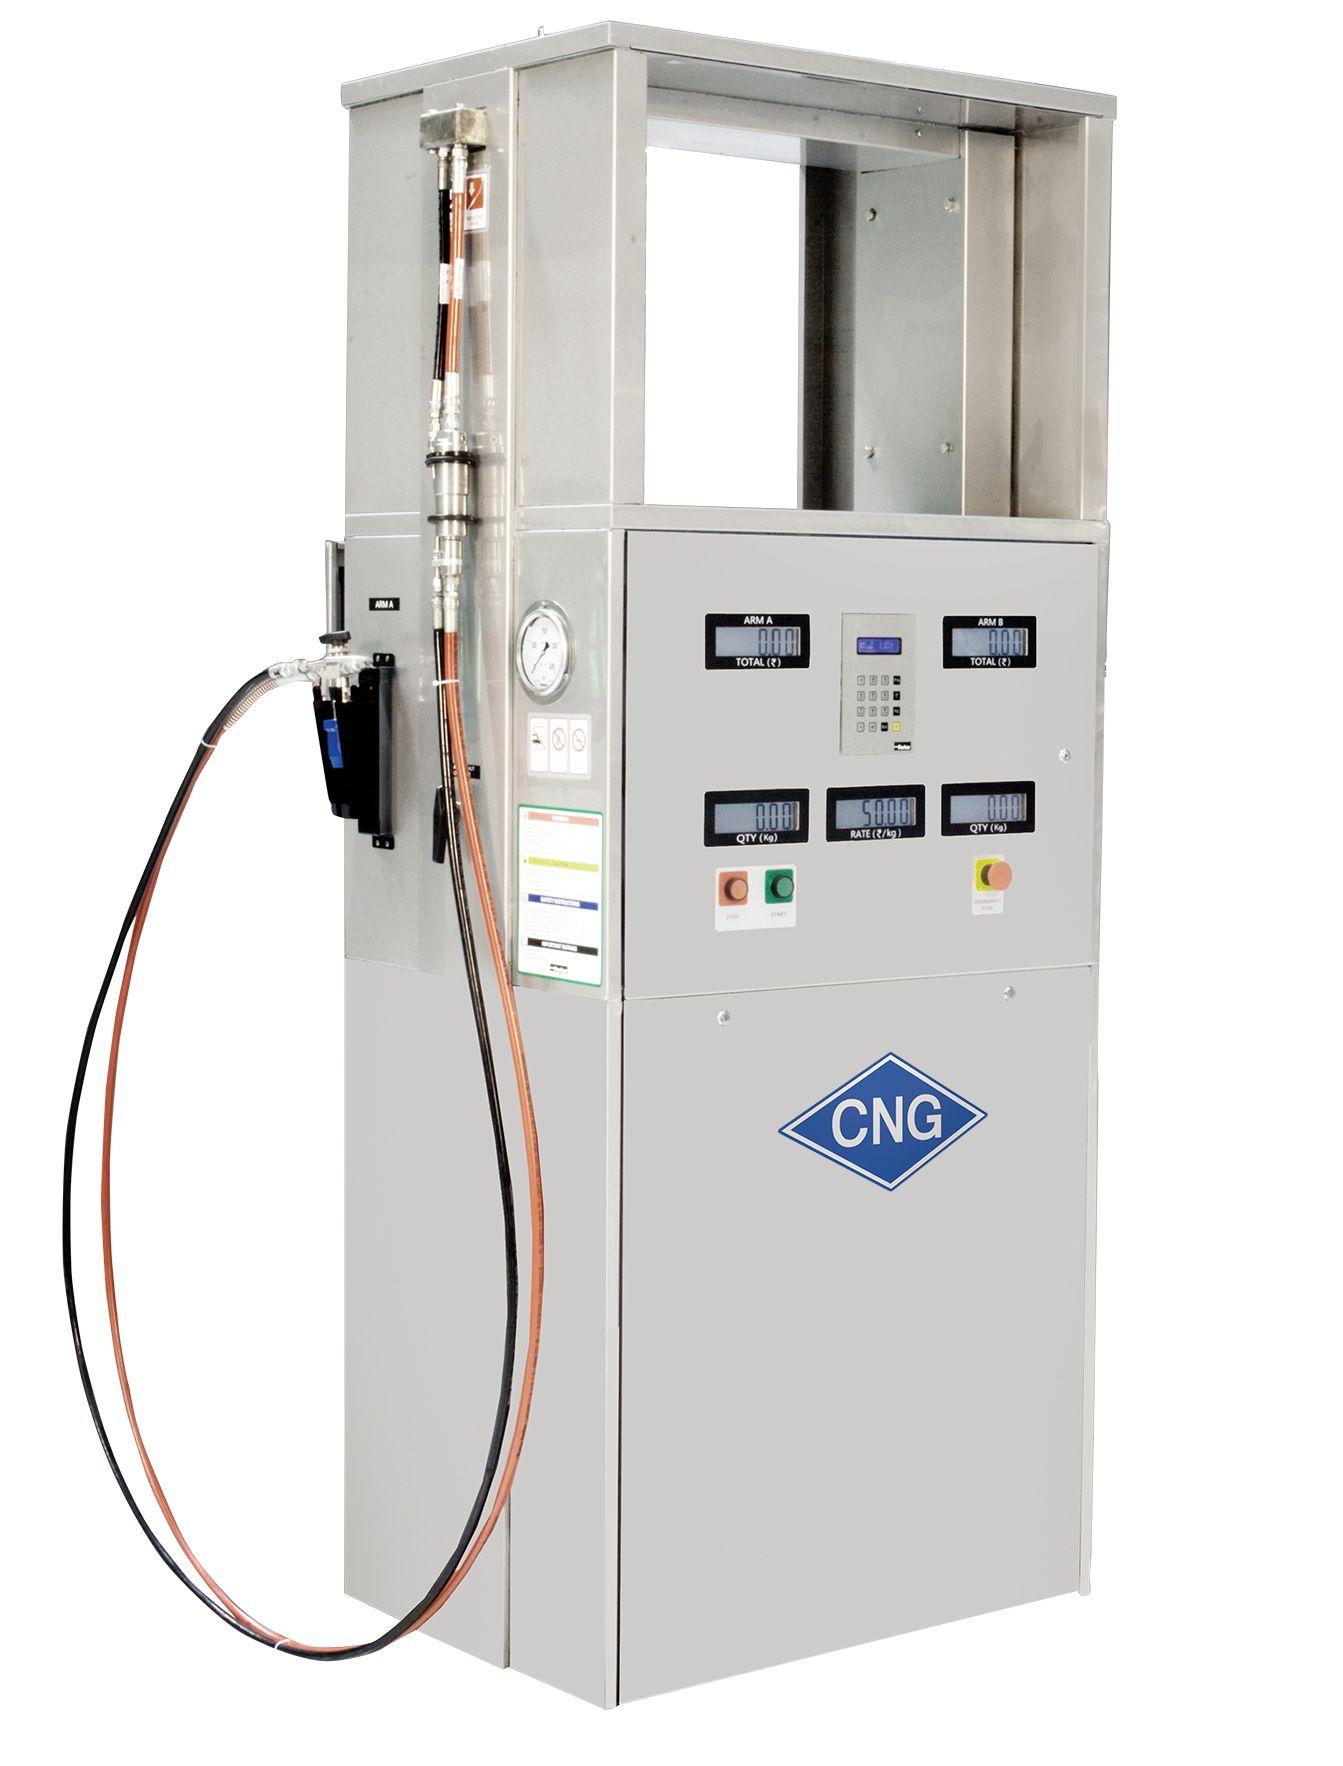 Parker Hannifin debuts CNG fuel dispenser